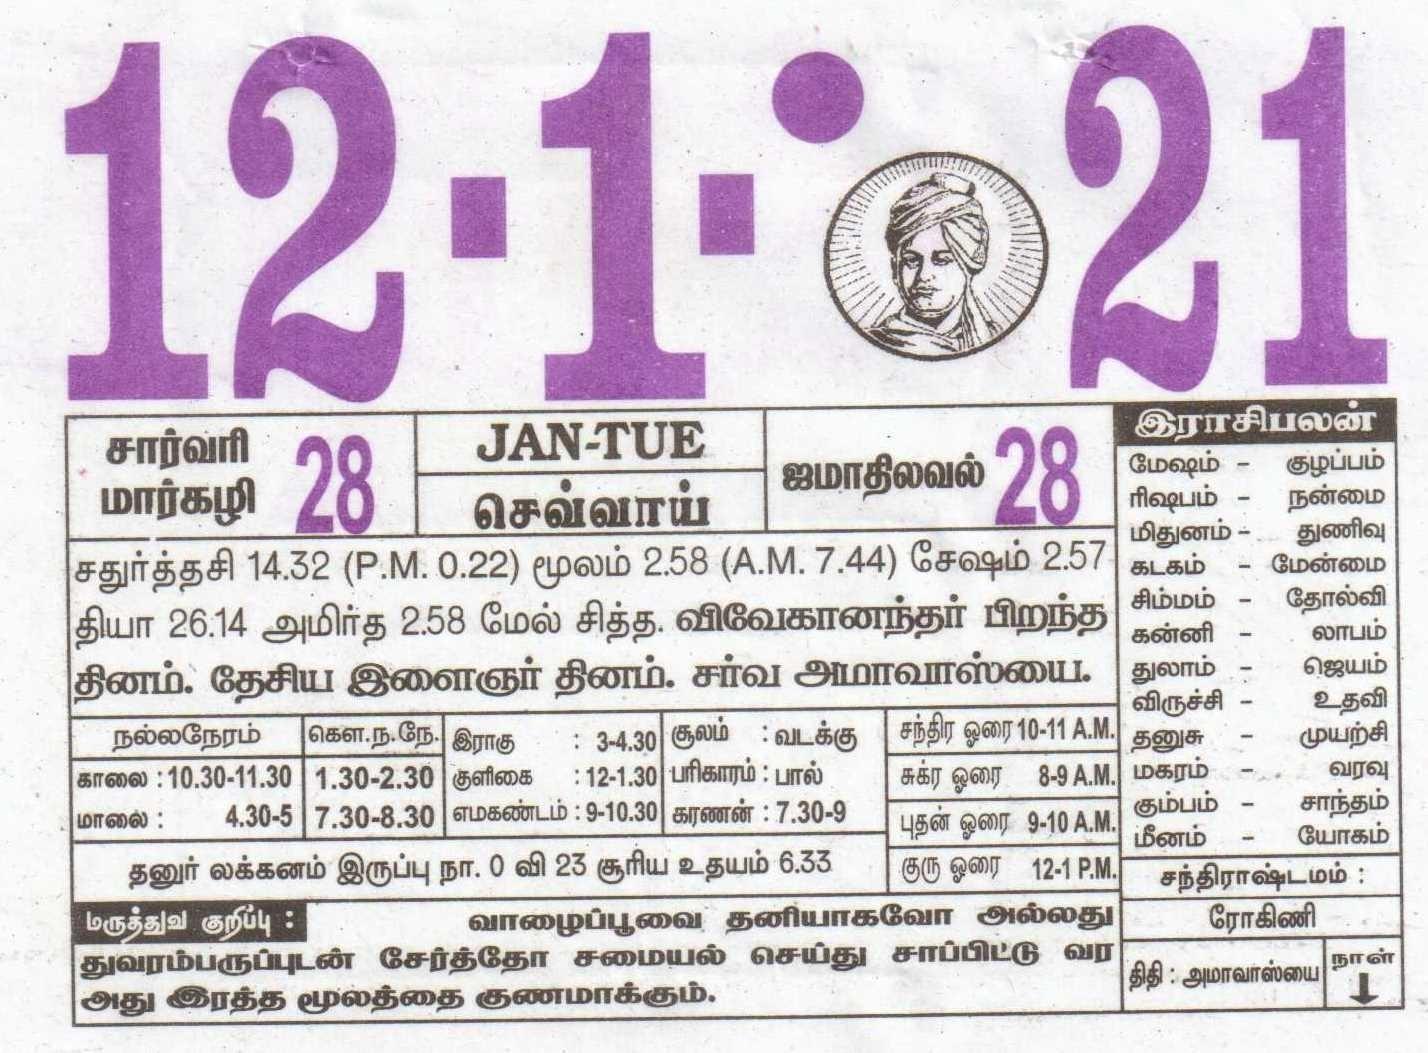 12-01-2021 Daily Calendar | Date 12 , January Daily Tear Off Calendar | Daily Panchangam Rasi Palan Marriage Dates In November 2021 Hindu Calendar